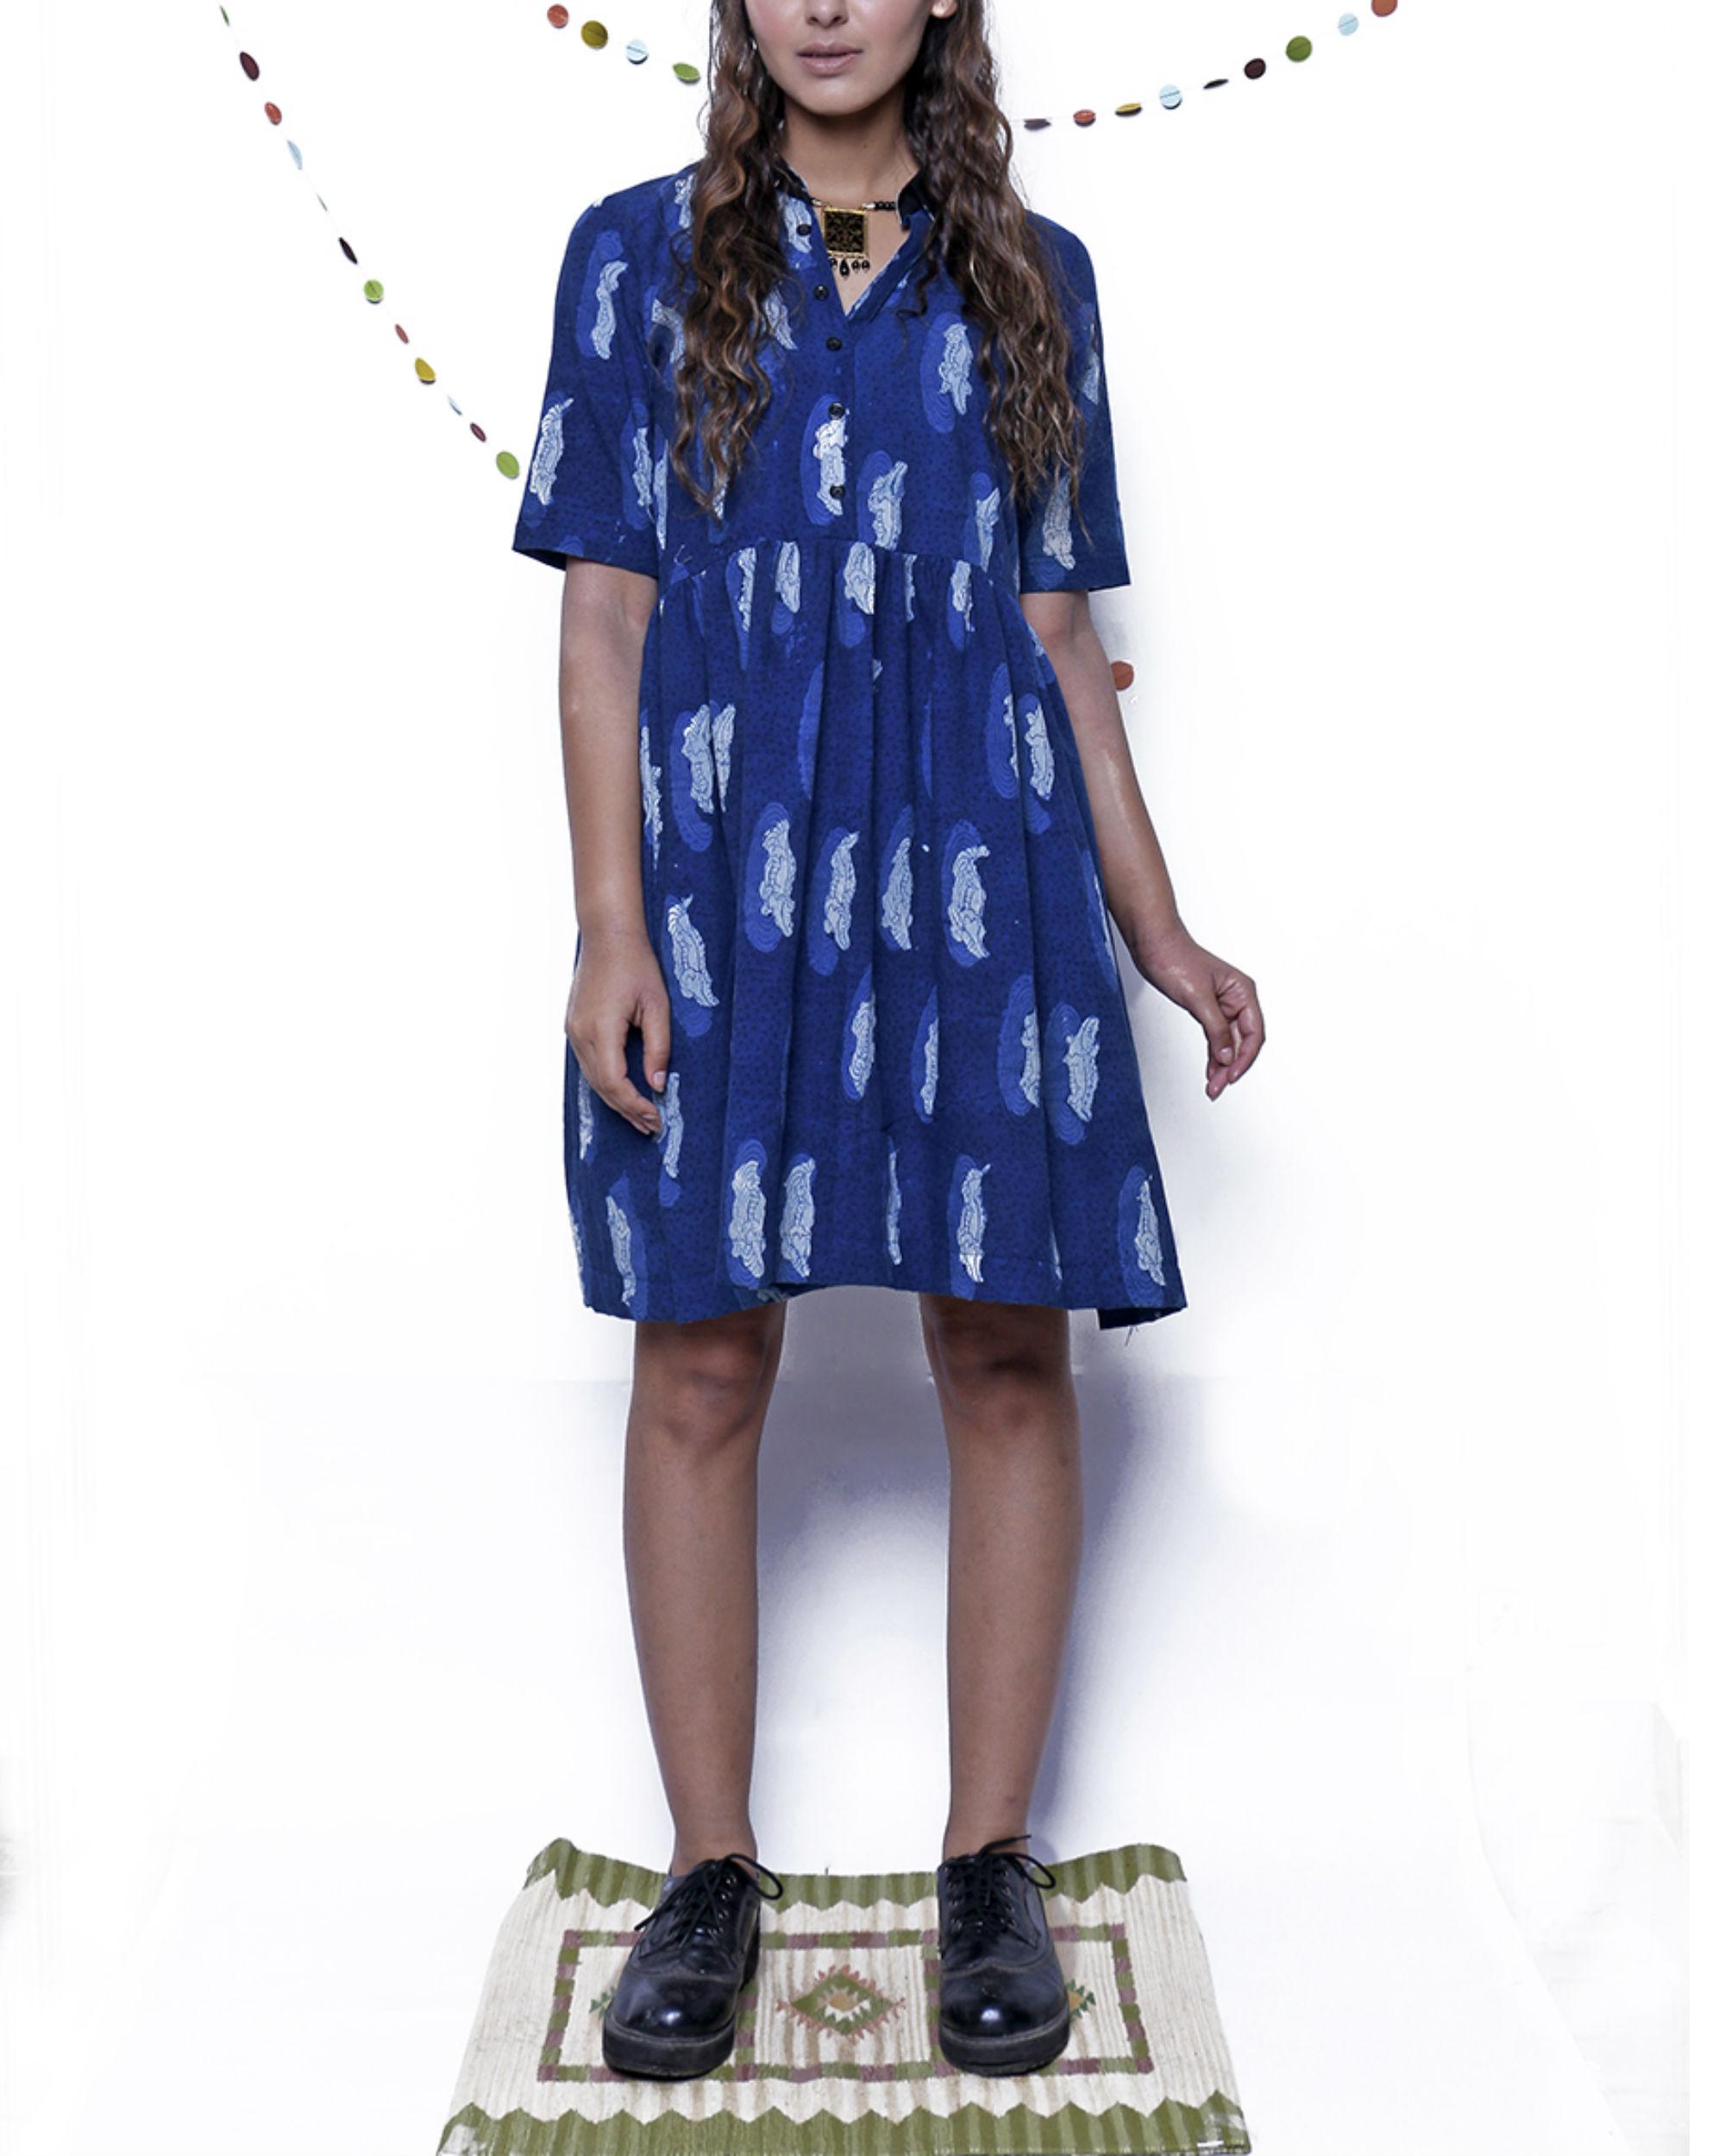 Indigo croc dress